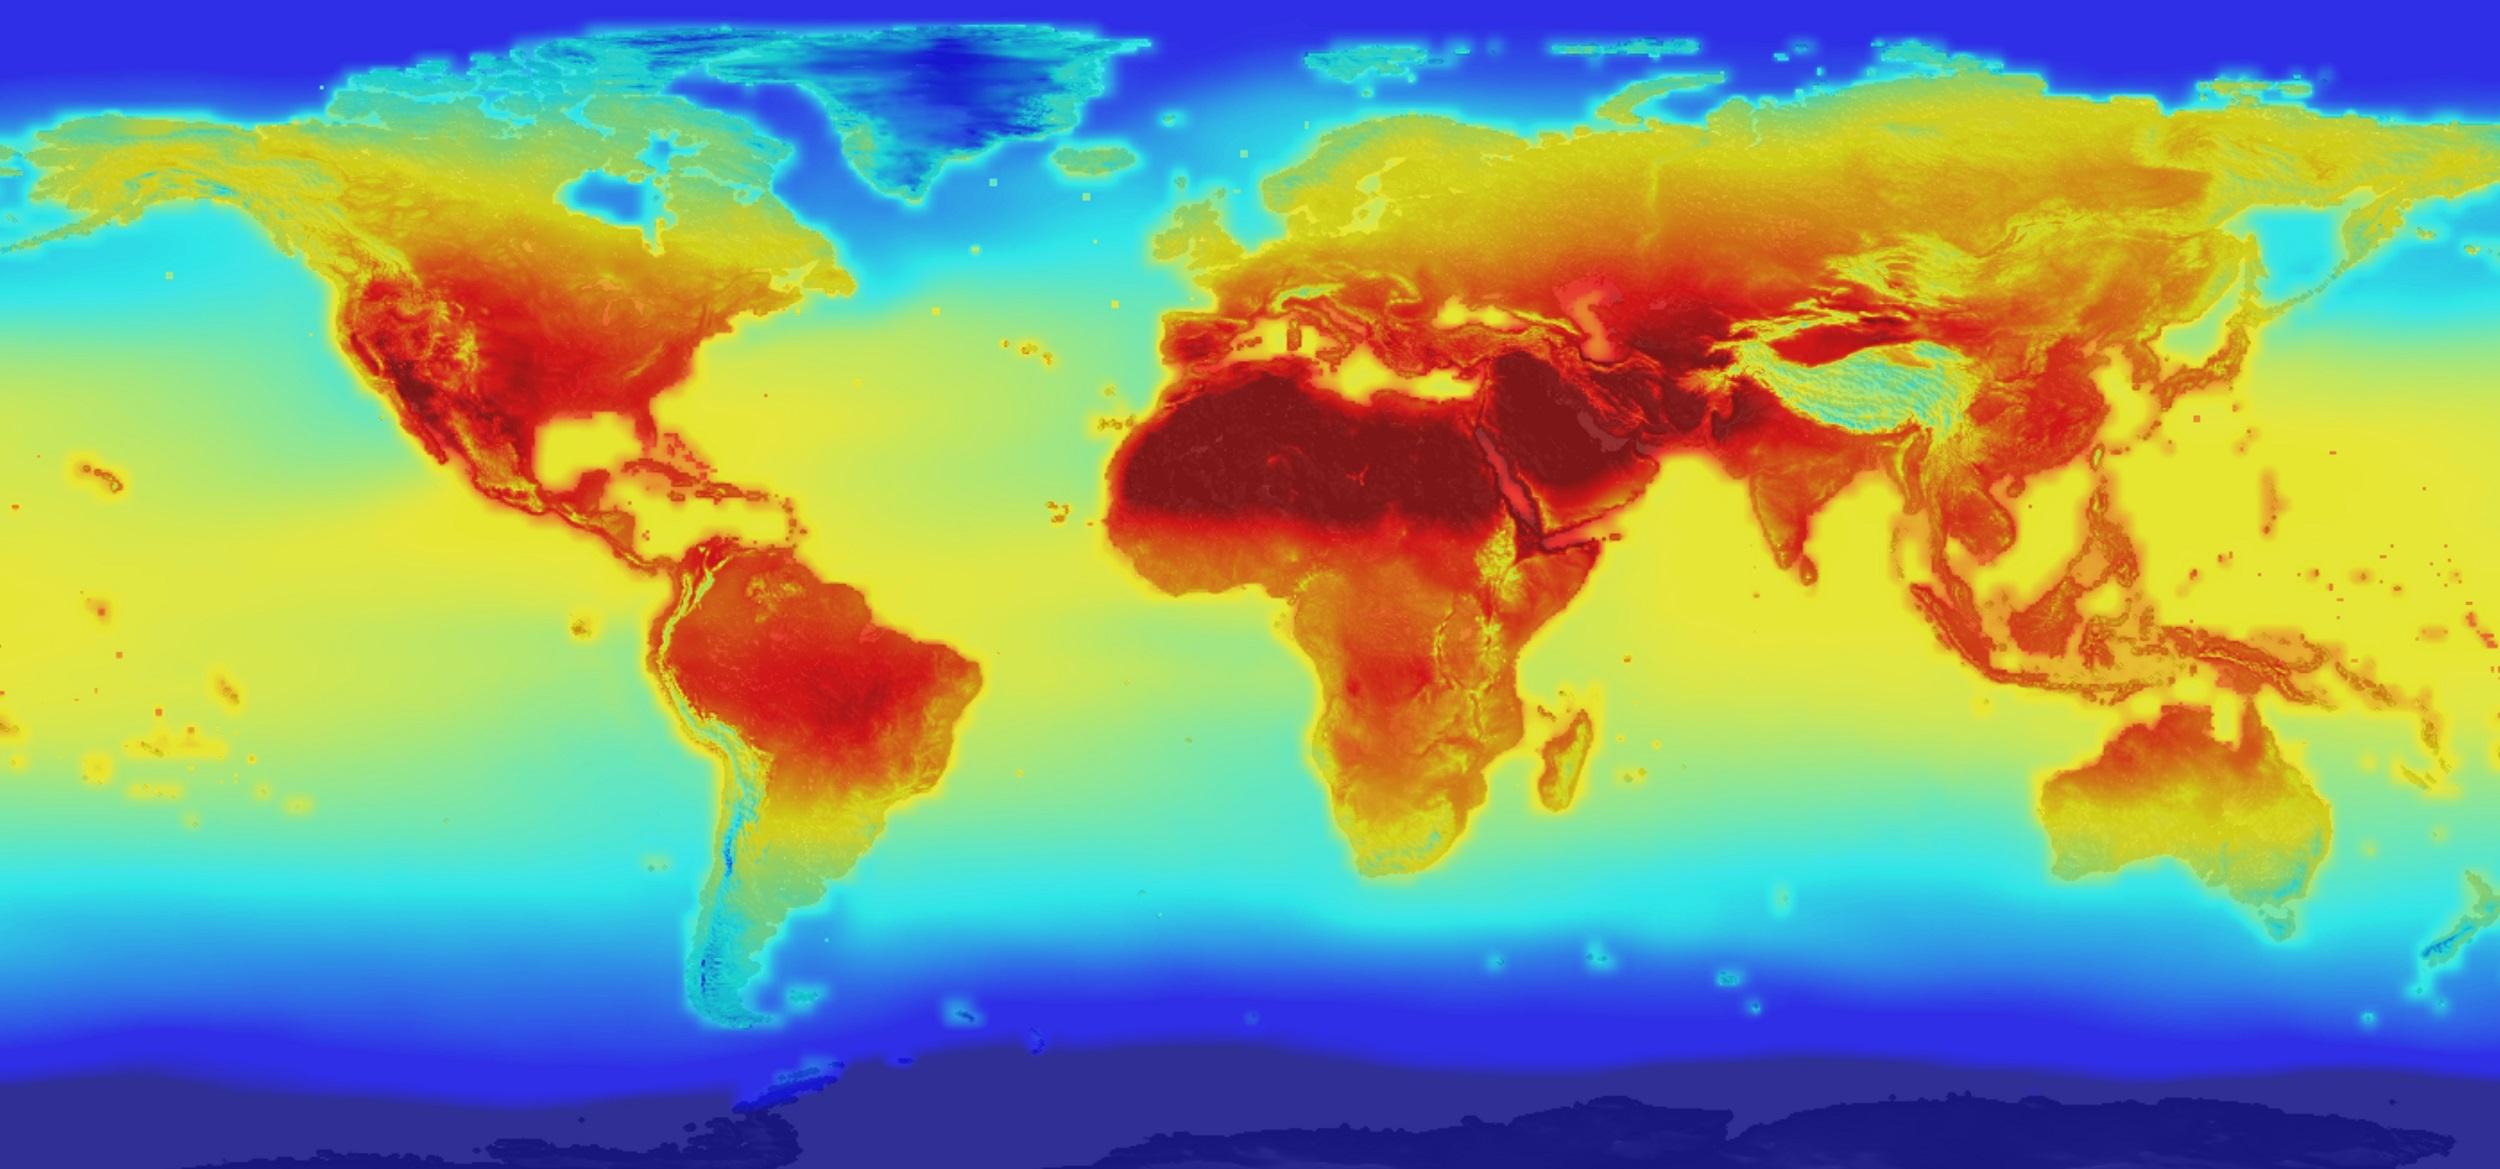 nasa scientist climate change - HD2500×1169